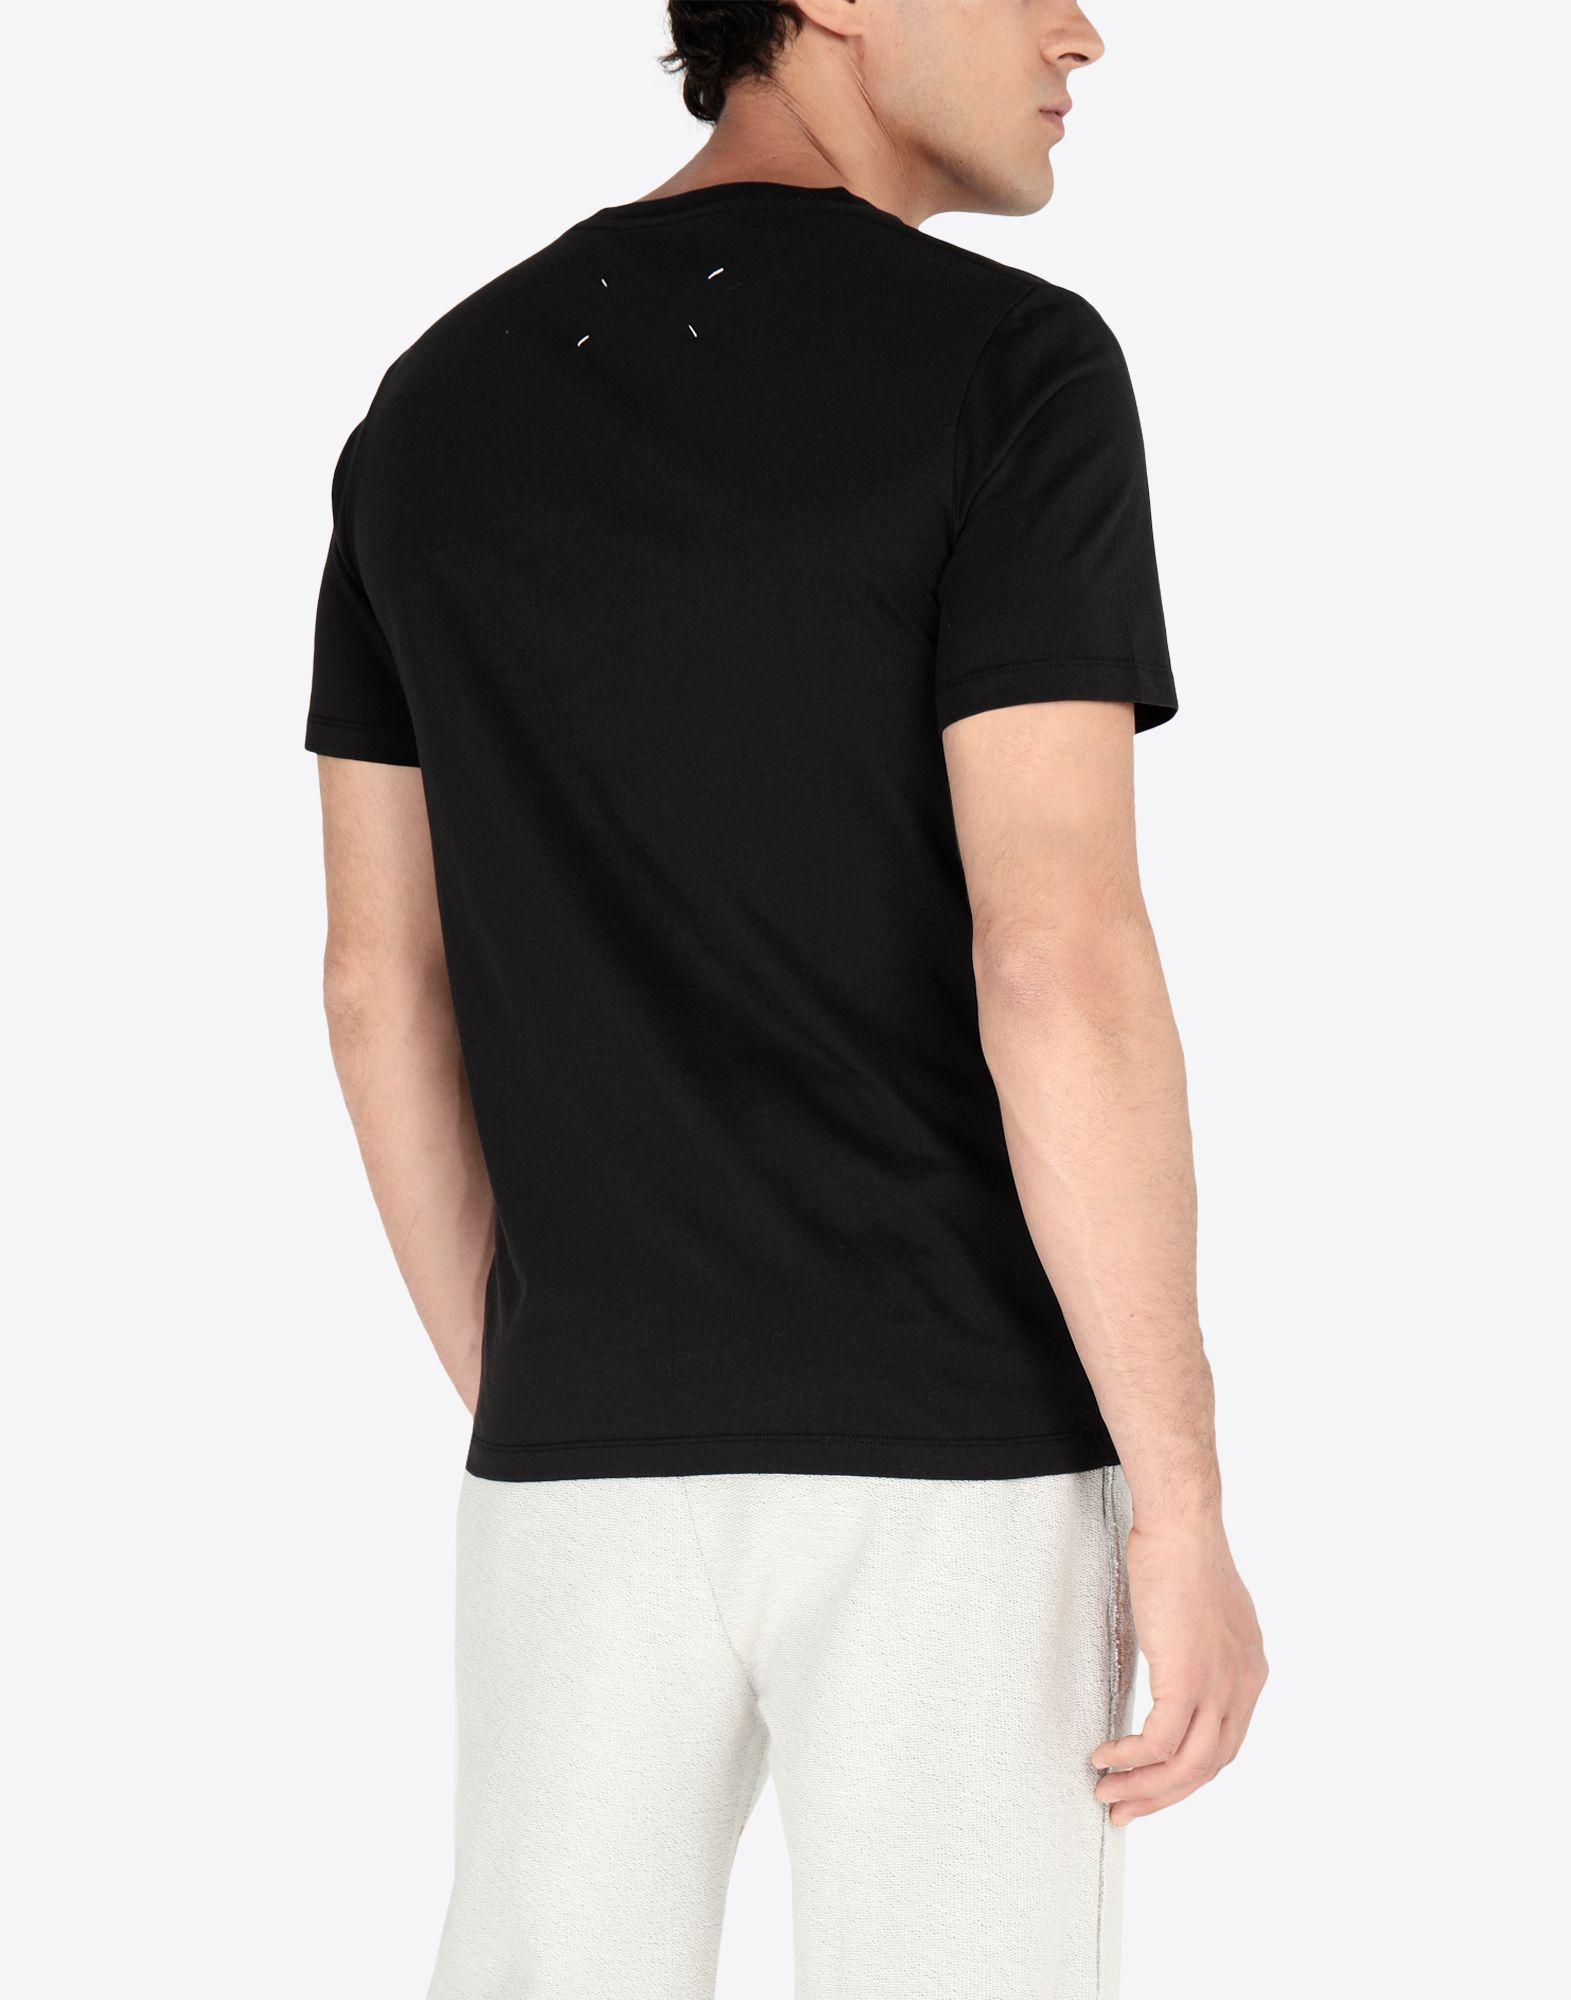 MAISON MARGIELA Stereotype' コットンTシャツ T シャツ メンズ e